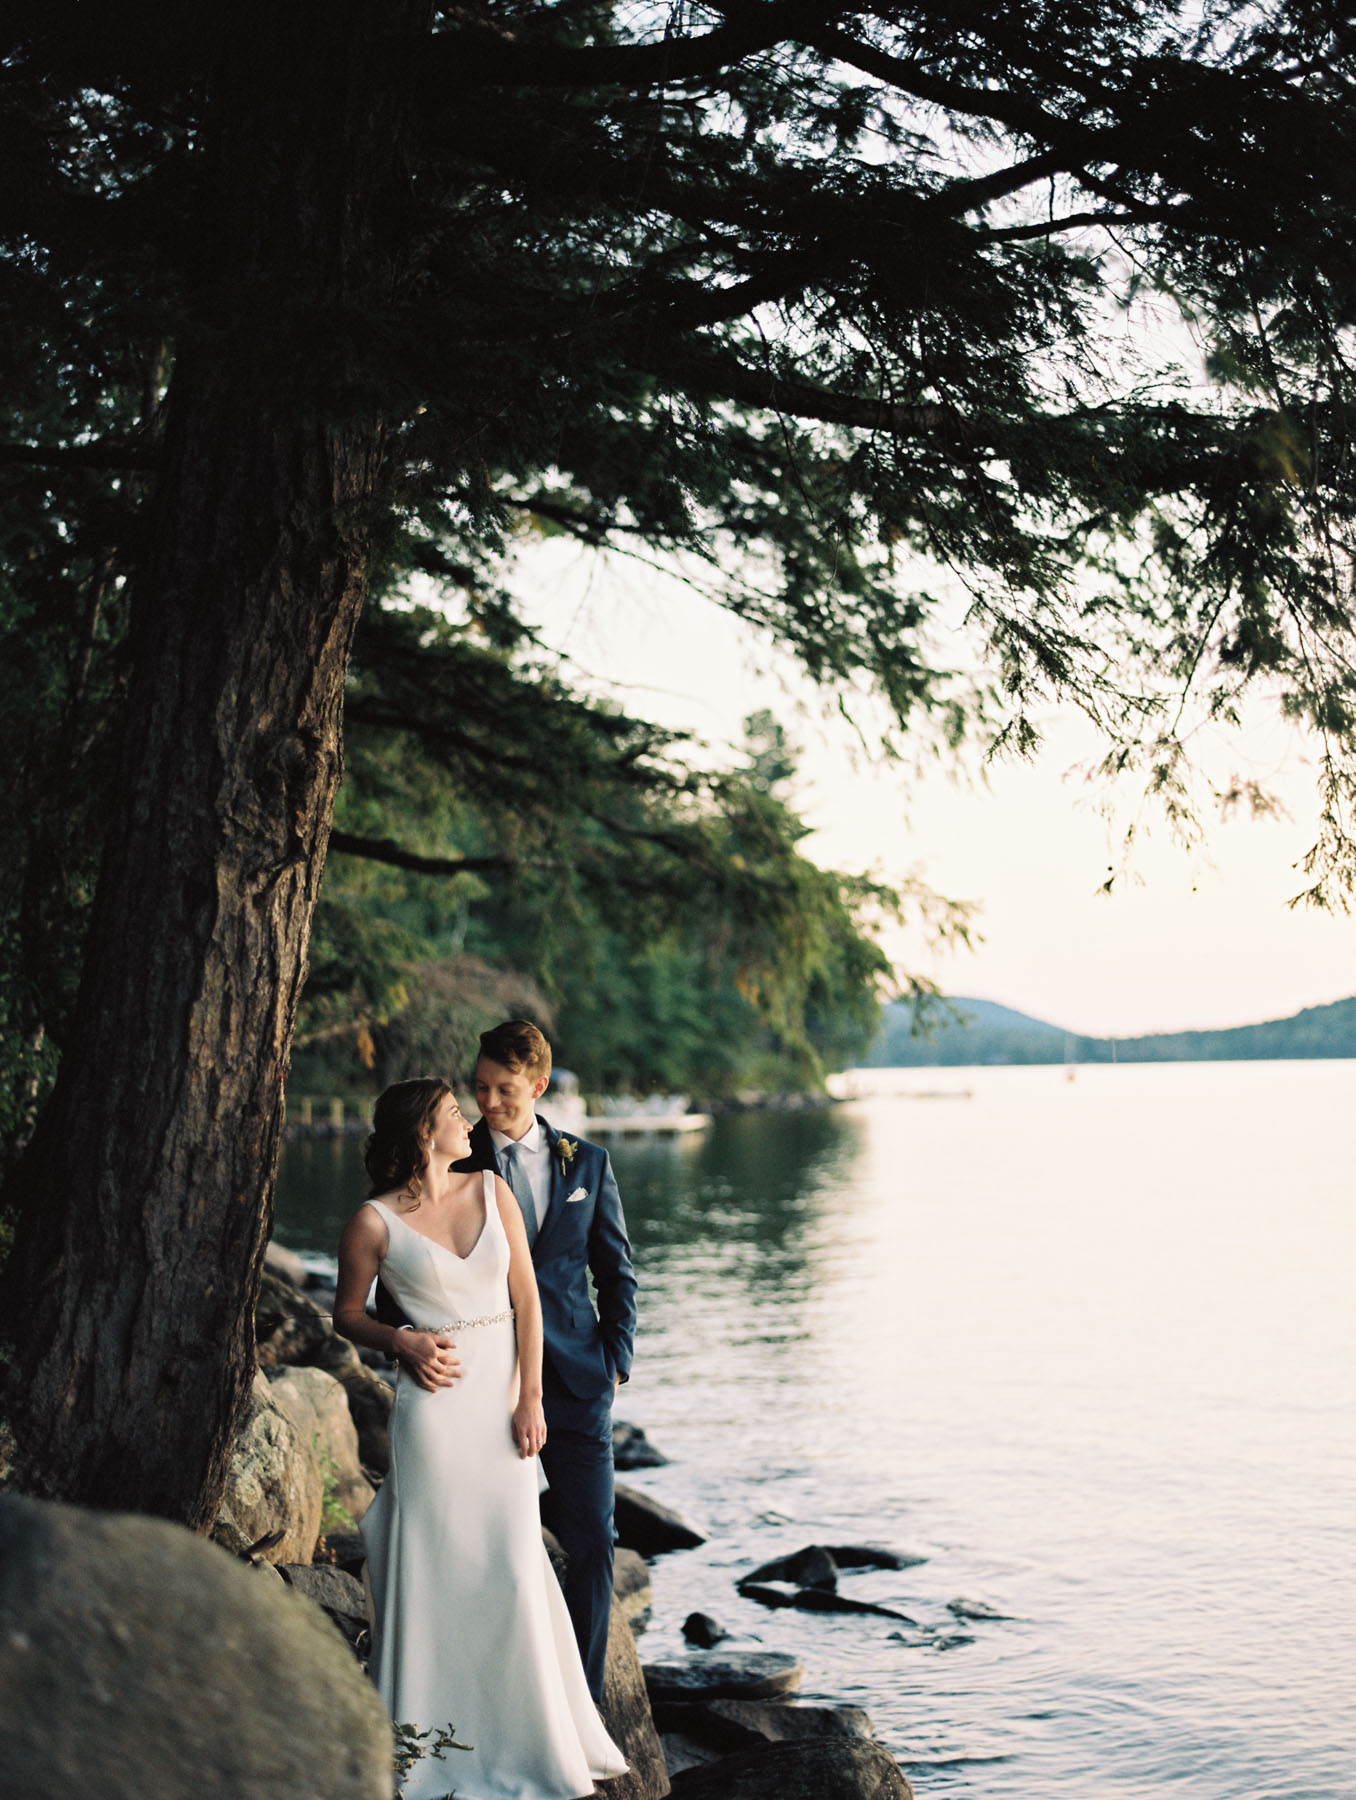 Wedding-Photography-Campground-30.jpg